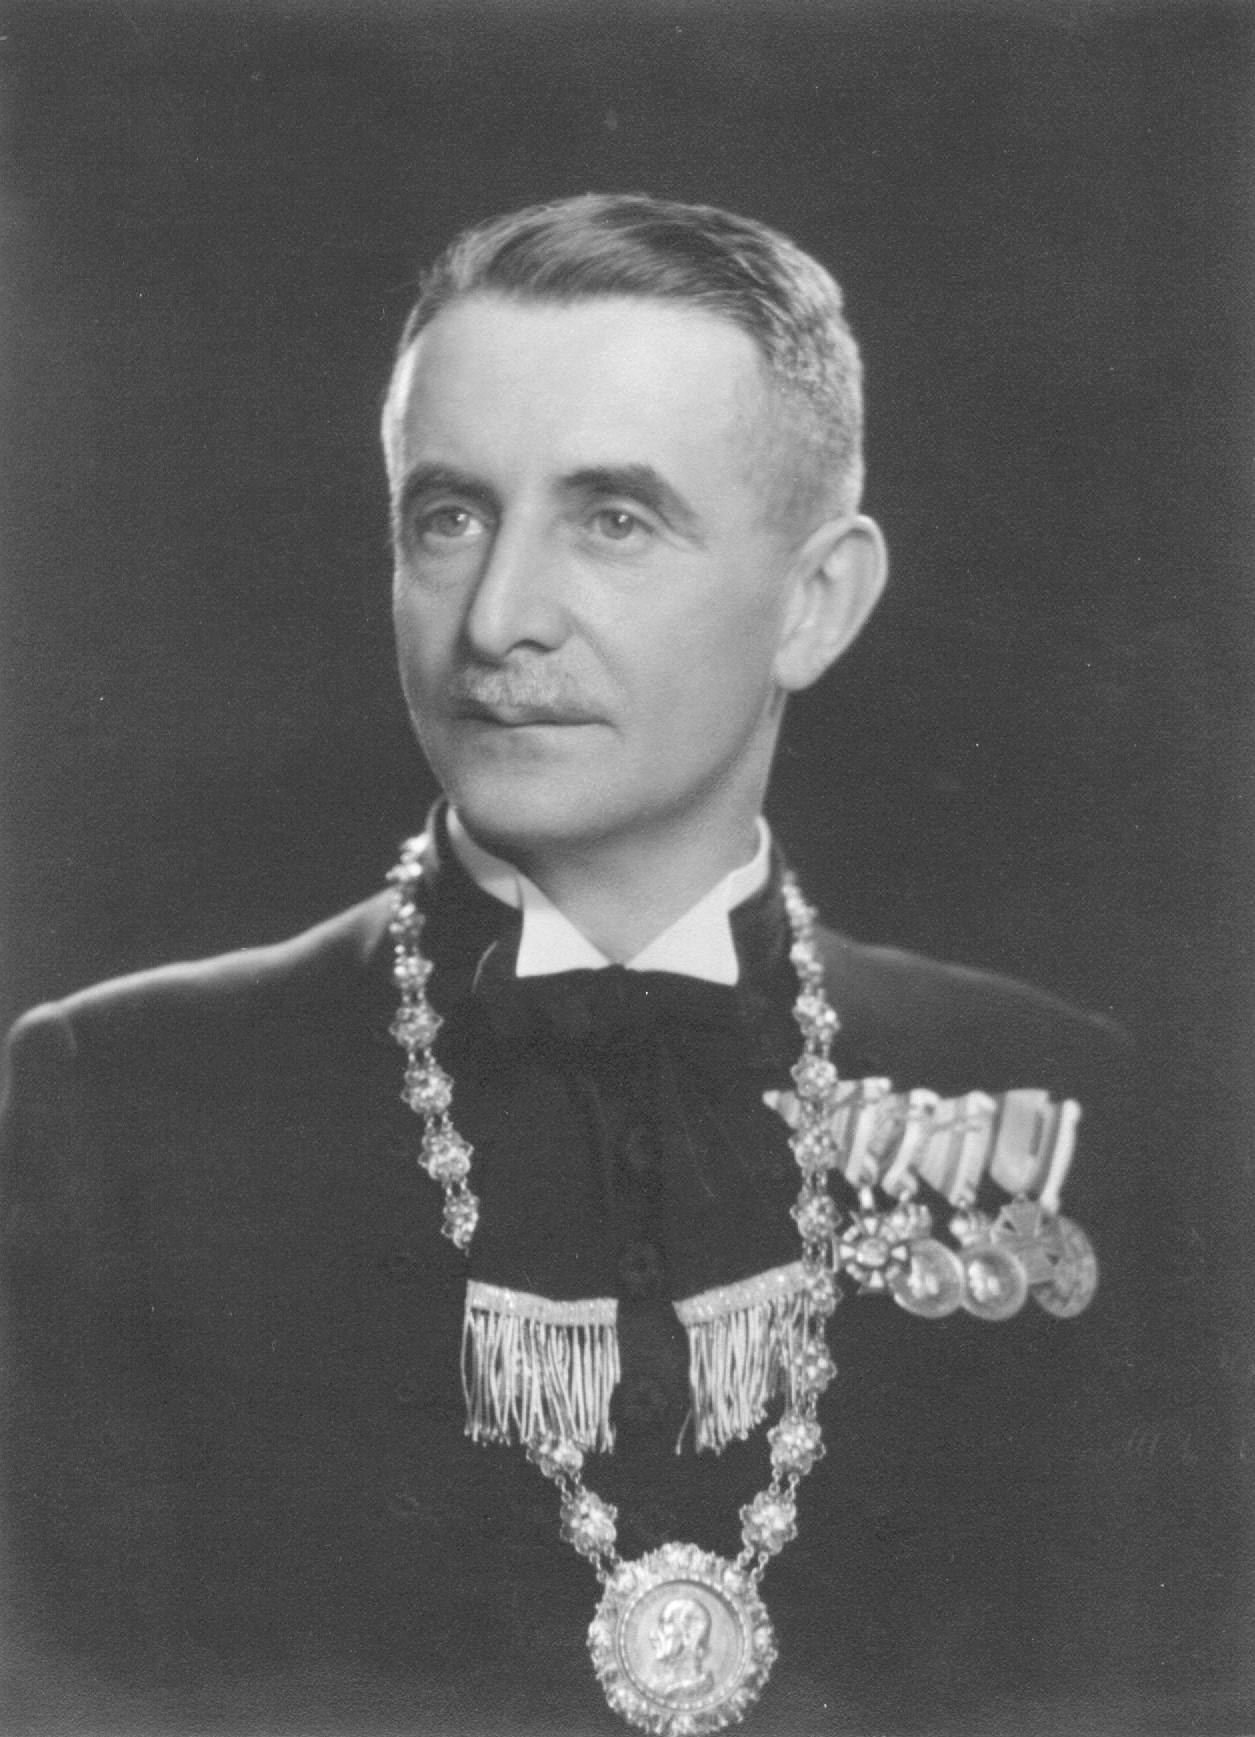 Modrovich Ferenc